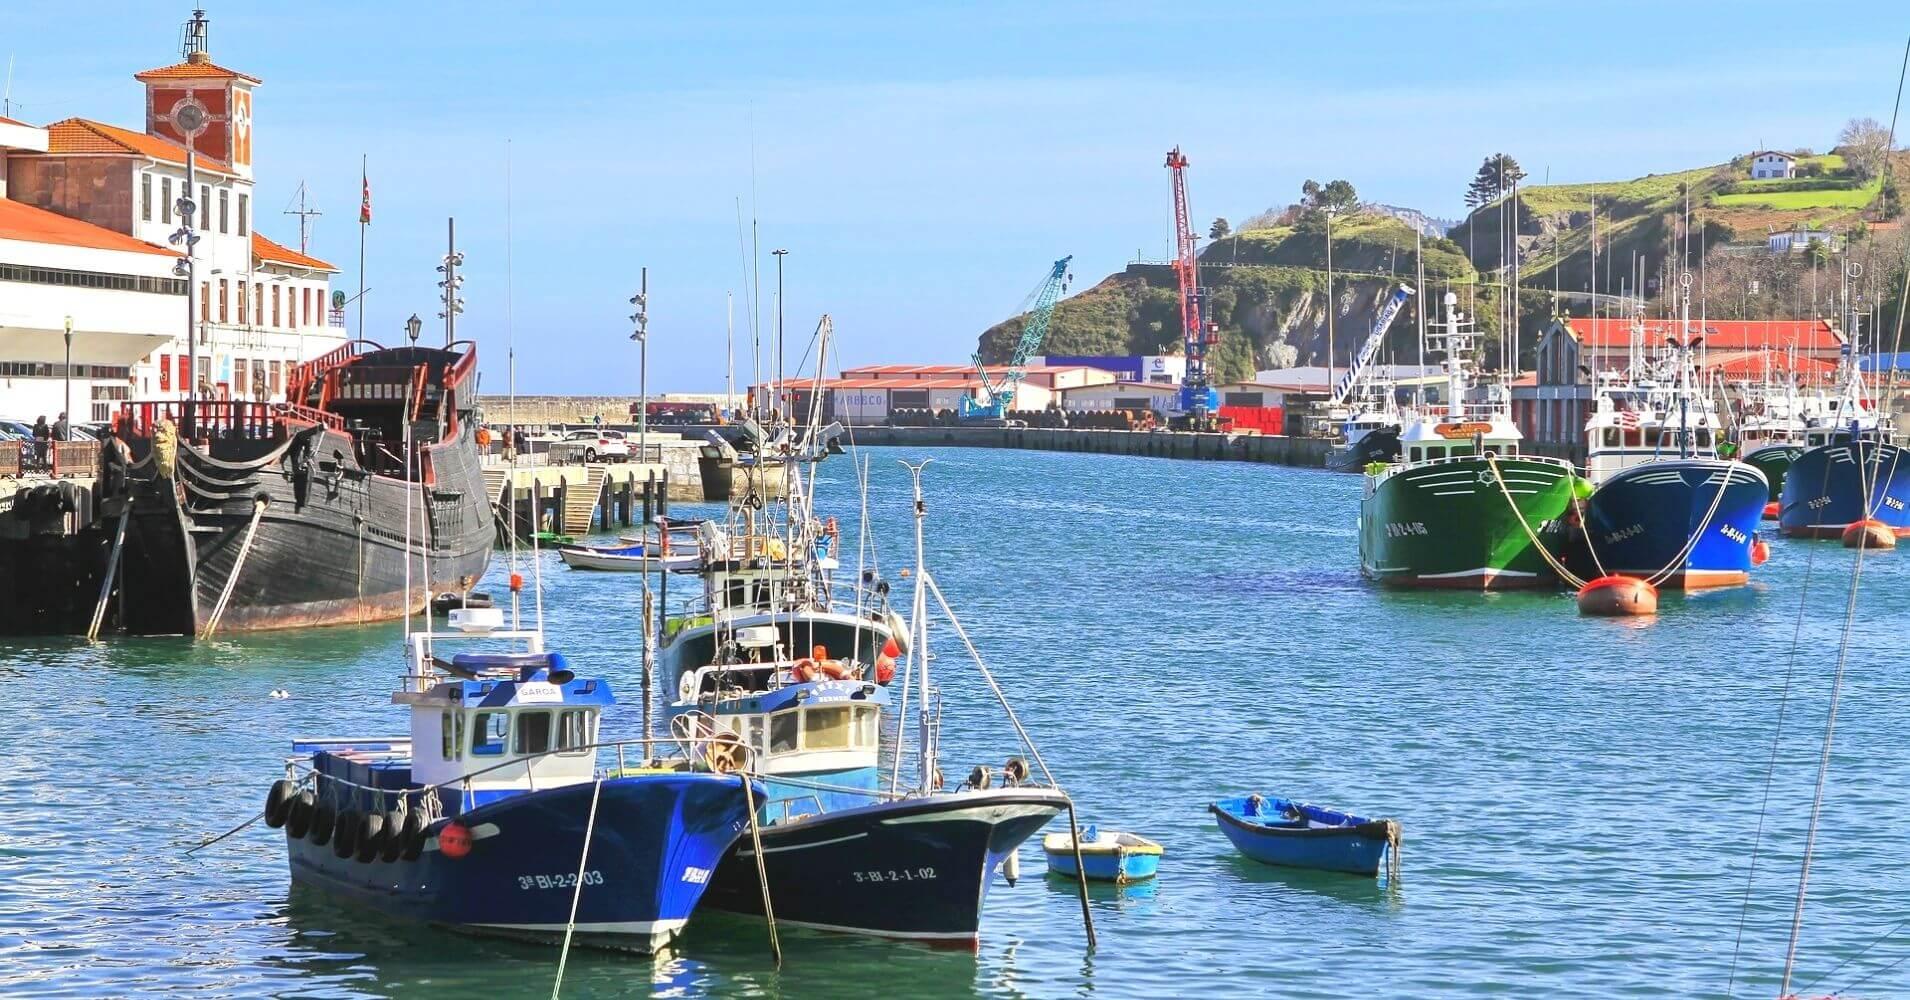 Puerto de Bermeo. Vizcaya. Euskadi, País Vasco.